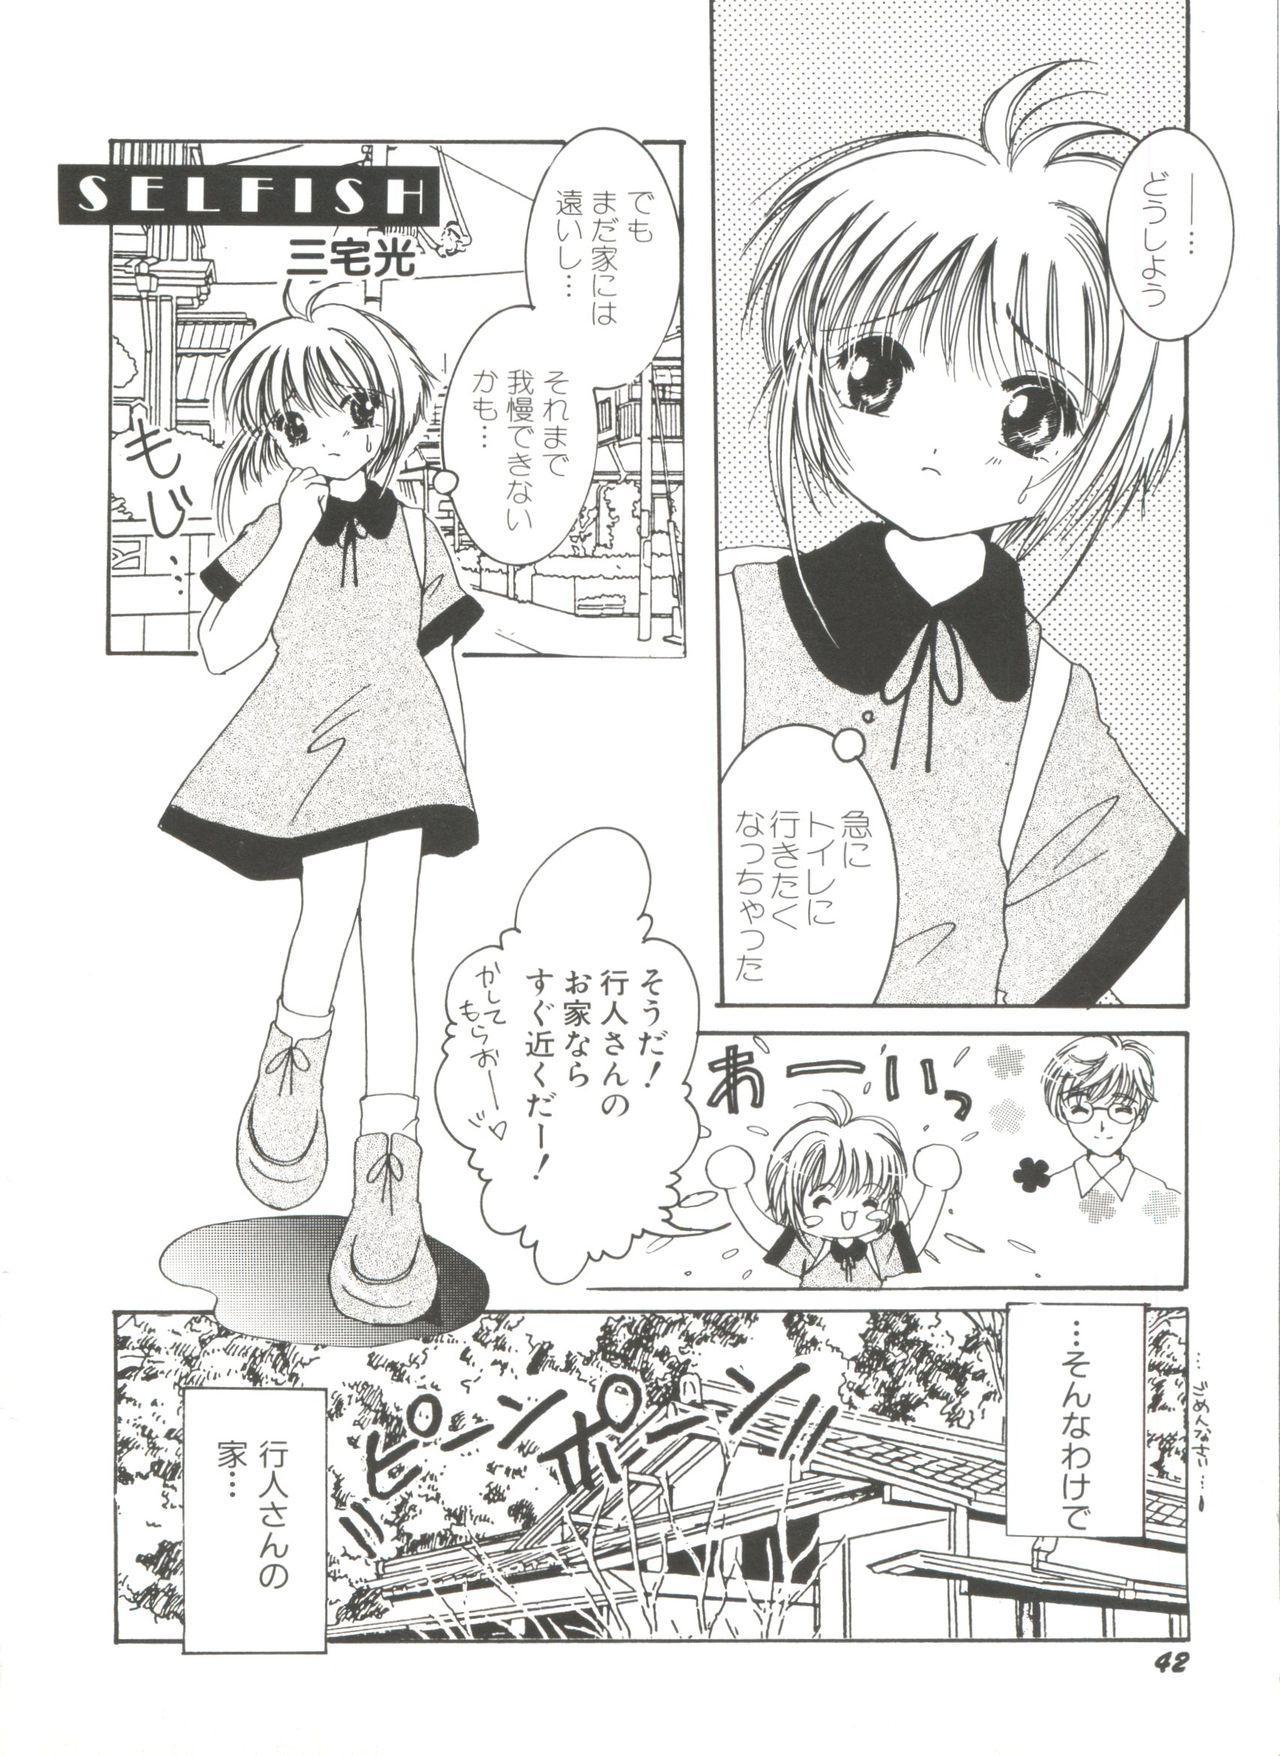 [Anthology] Denei Tamatebako 8 - Utakata no Tenshi-tachi II (Various) 43